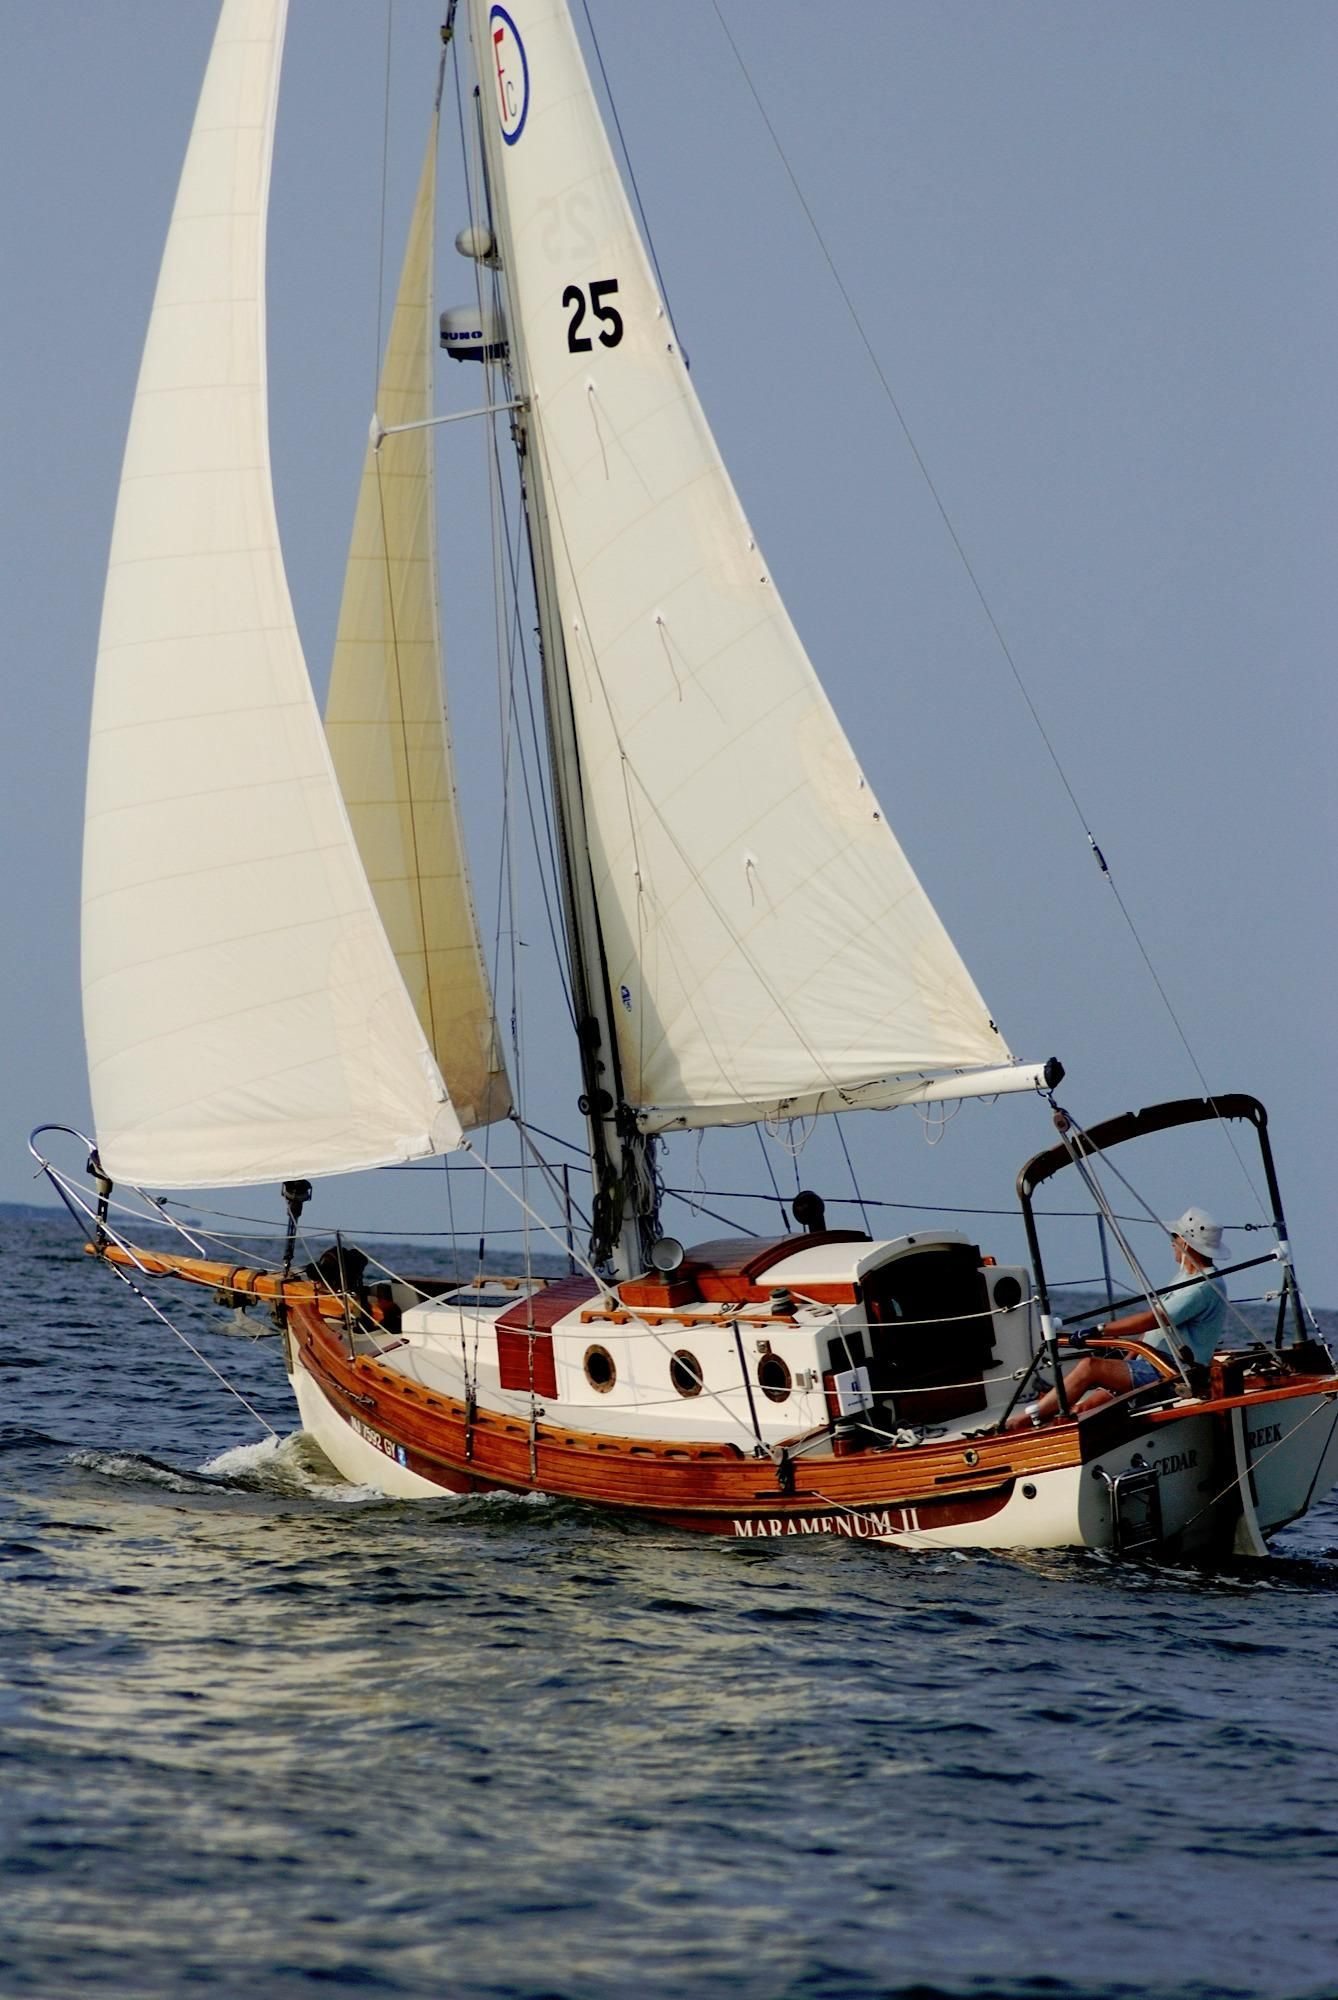 1985 sam l morse falmouth cutter 22 sail boat for sale gaff cutter sail boats pinterest. Black Bedroom Furniture Sets. Home Design Ideas